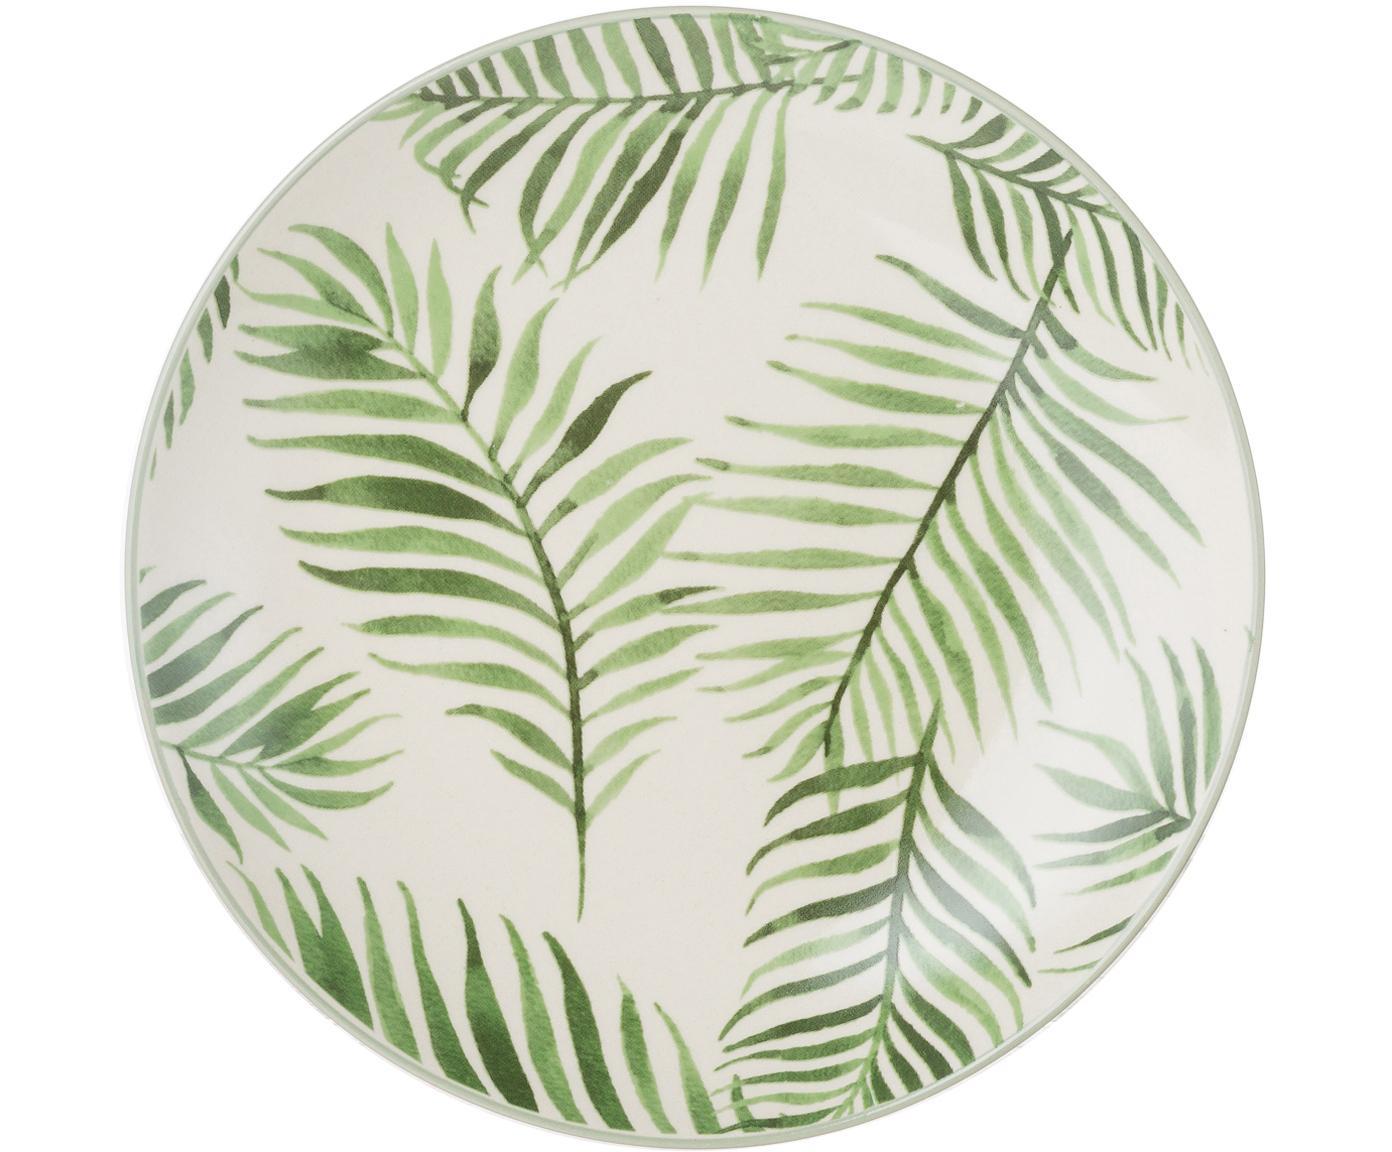 Piatto da colazione con motivo tropicale Jade 4 pz, Terracotta, Beige, verde, Ø 20 cm